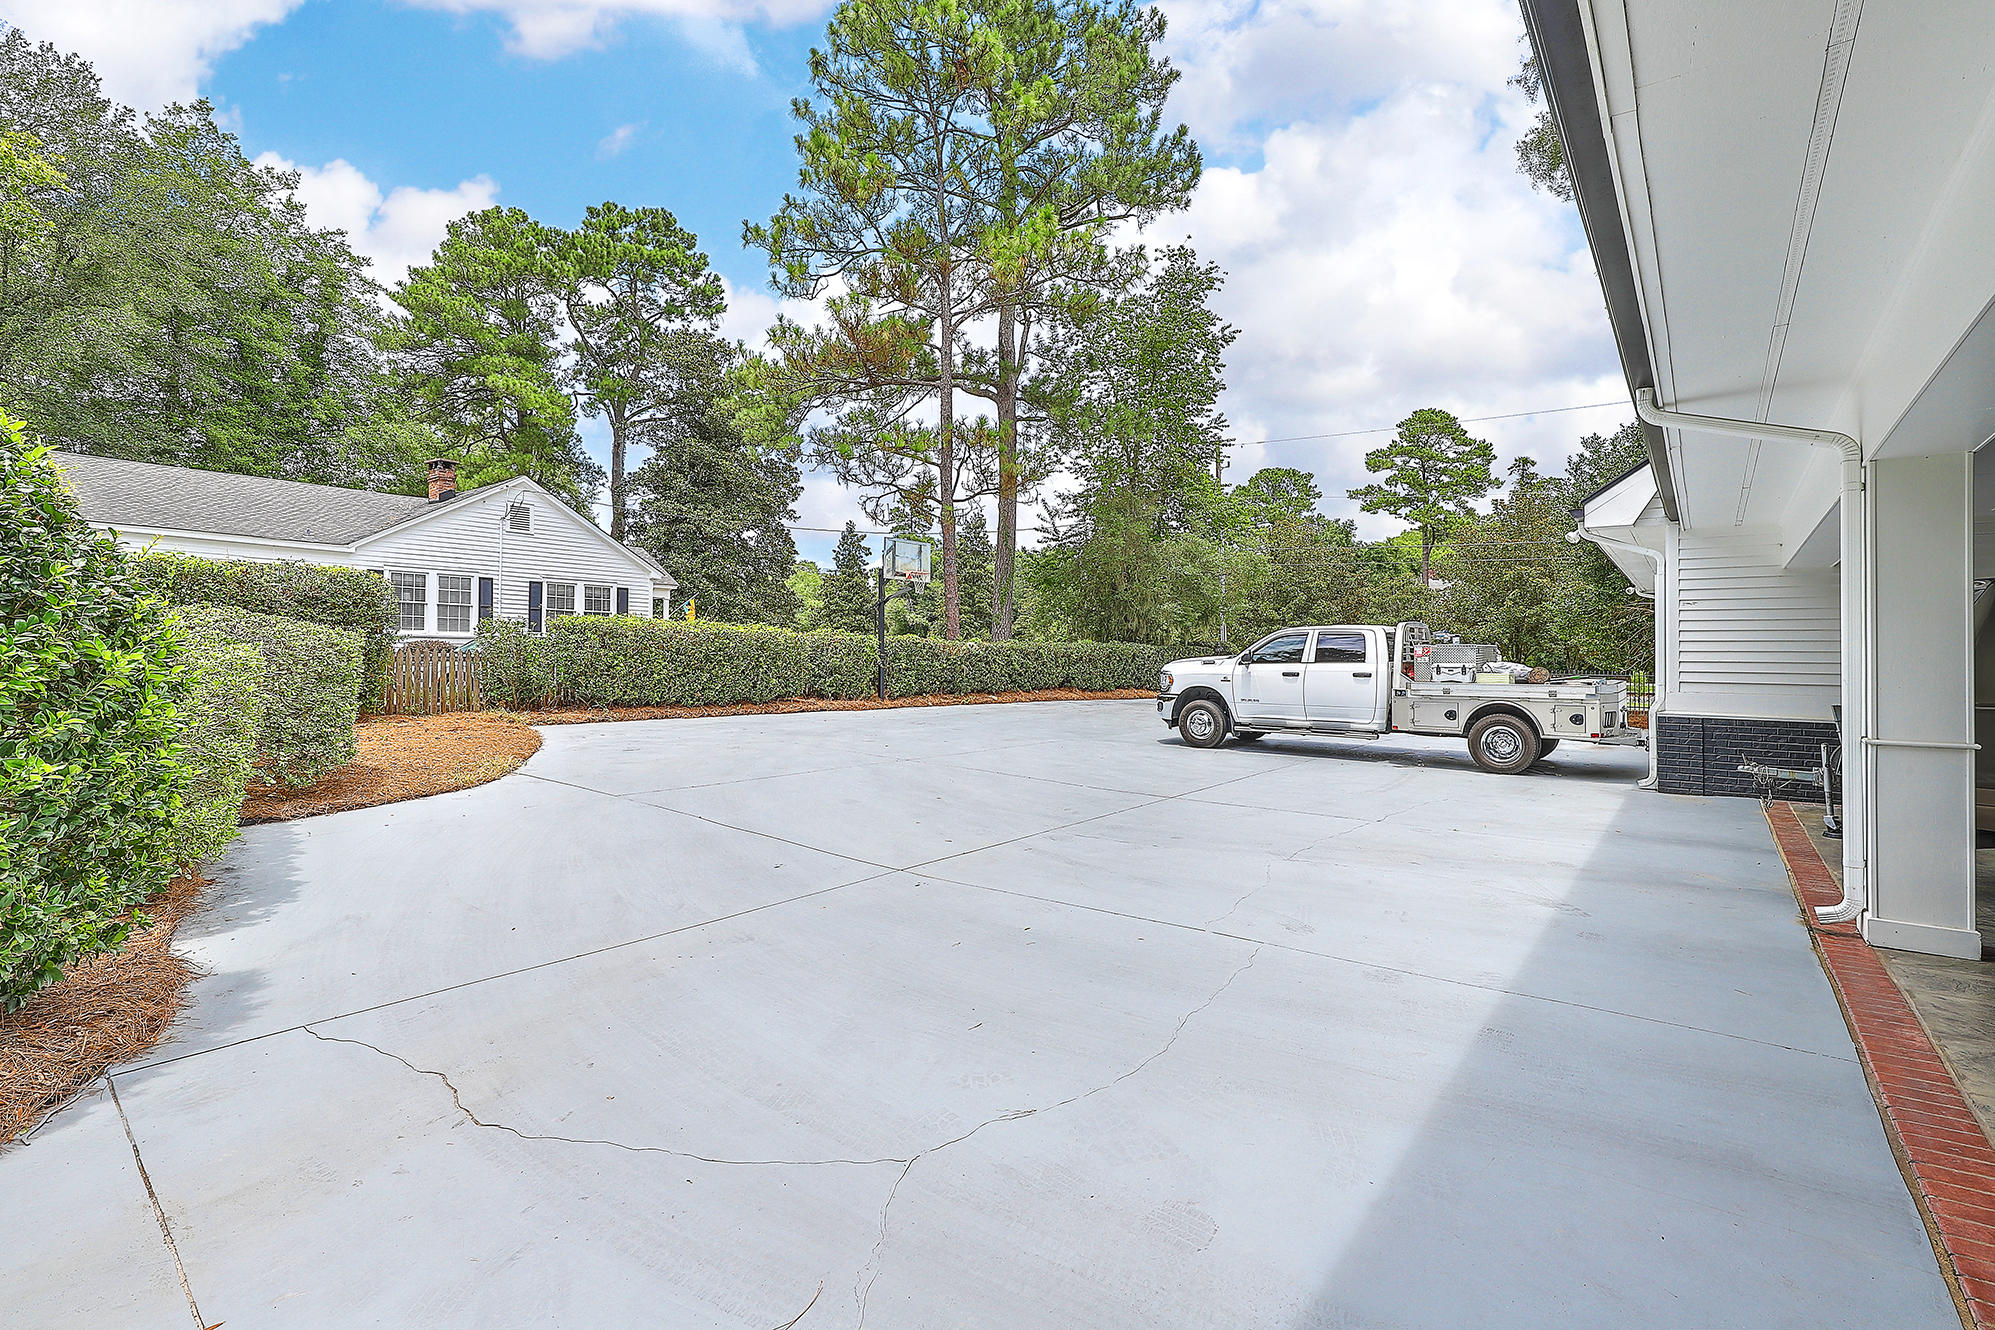 Summerville Homes For Sale - 102 Hickory, Summerville, SC - 12